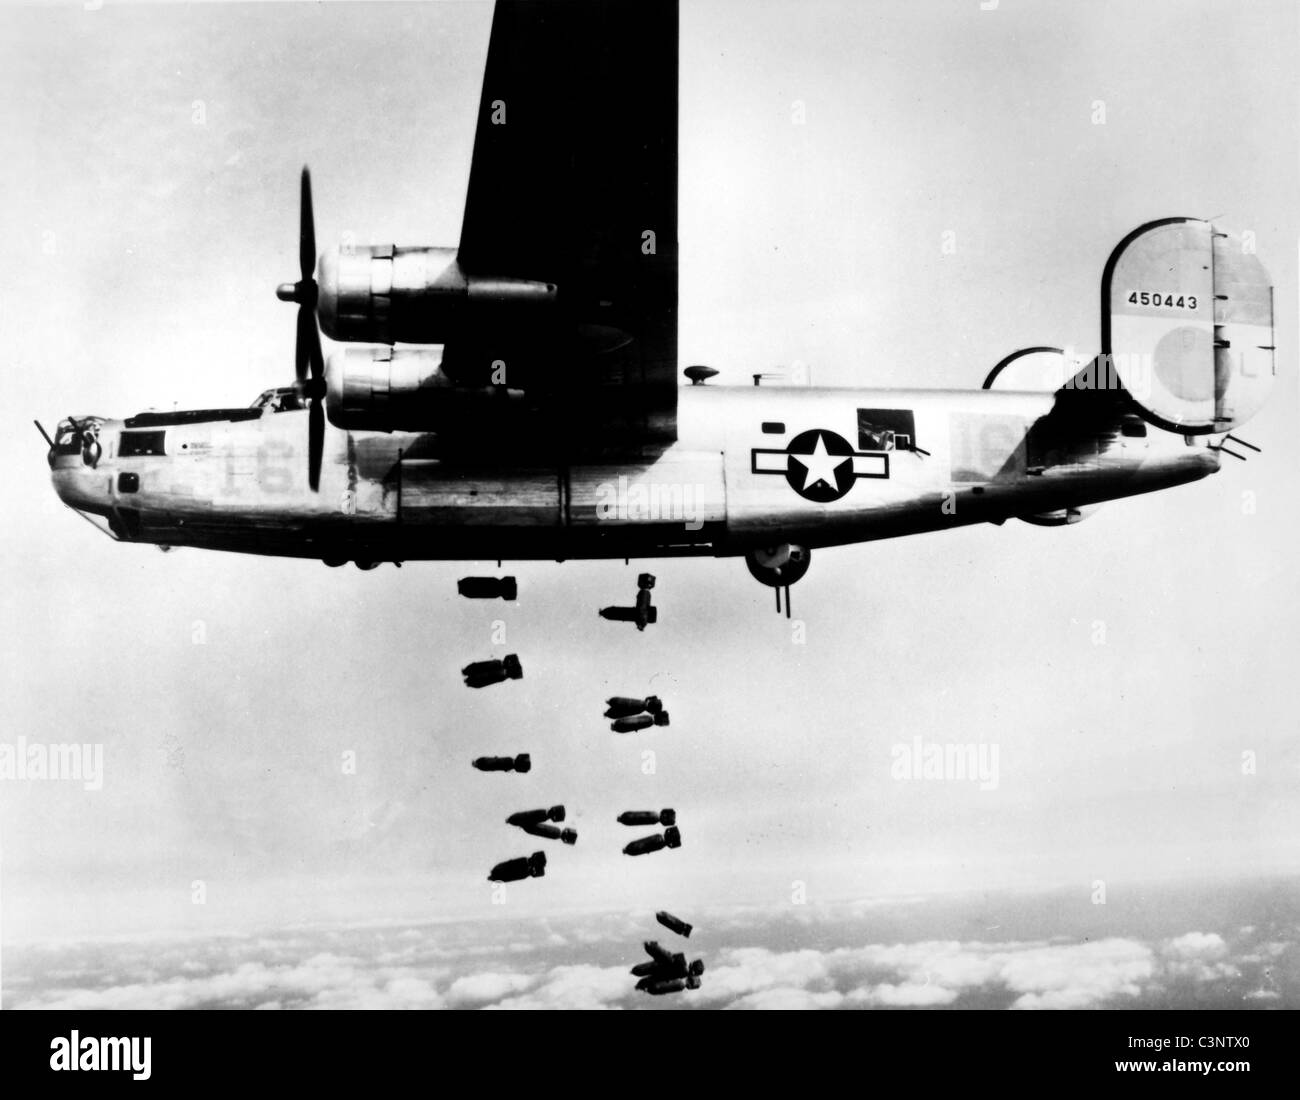 Un consolidated B-24 Liberator de la 15ª A.F. libera sus bombas sobre la railyards en Muhldorf, Alemania, el Imagen De Stock